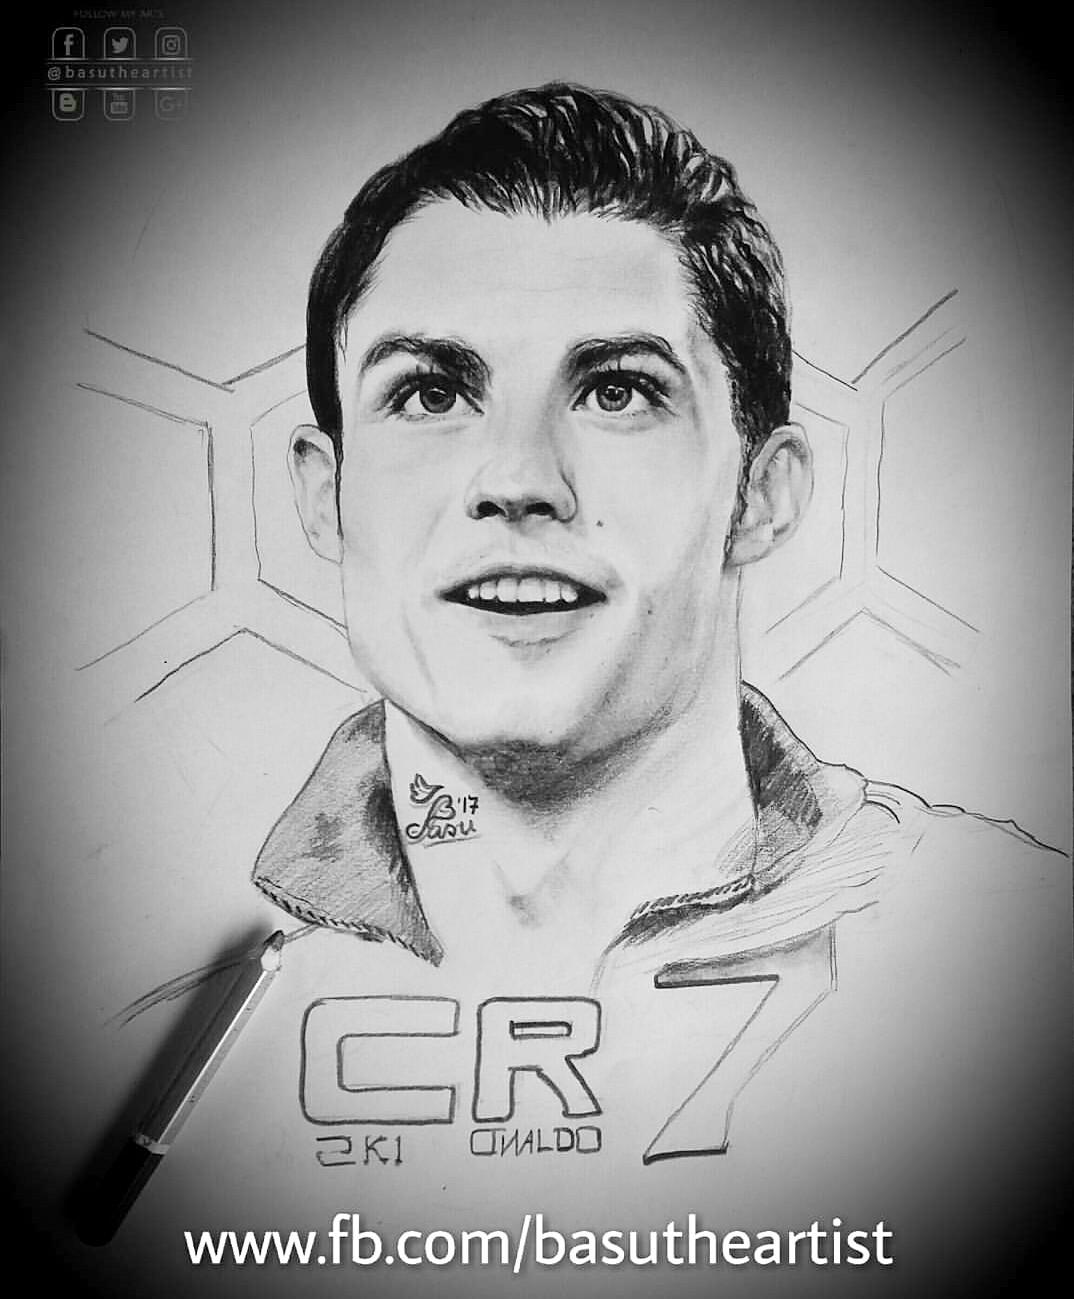 Cristiano ronaldo pencil sketch